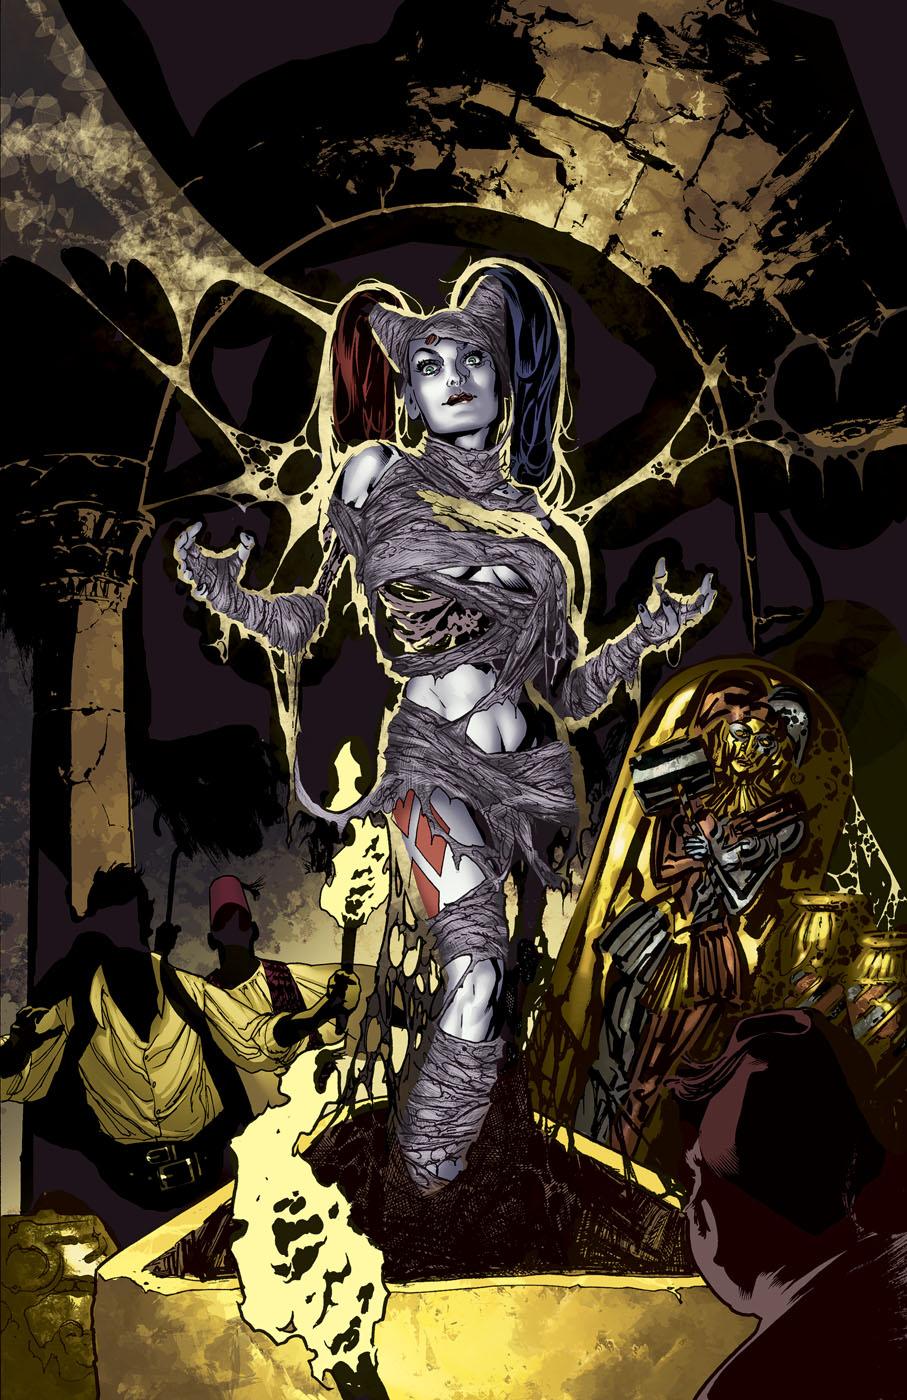 Harley Quinn Vol 2 21 Textless Monsters of the Month Variant.jpg